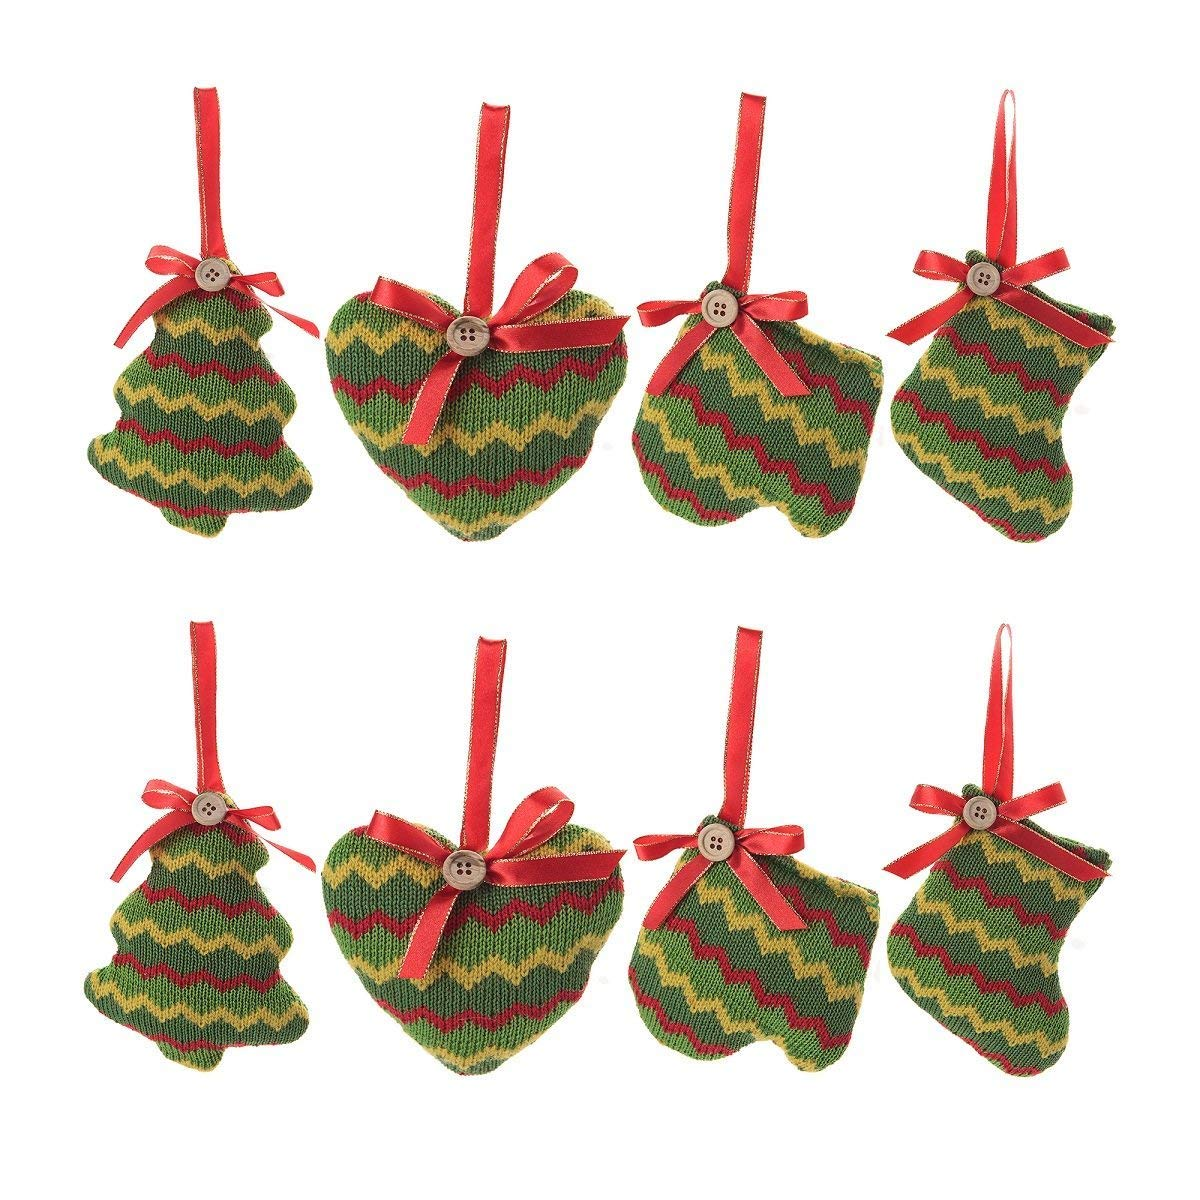 Amazon.com: Christmas Tree Ornaments Stocking Decorations - 8pcs ...